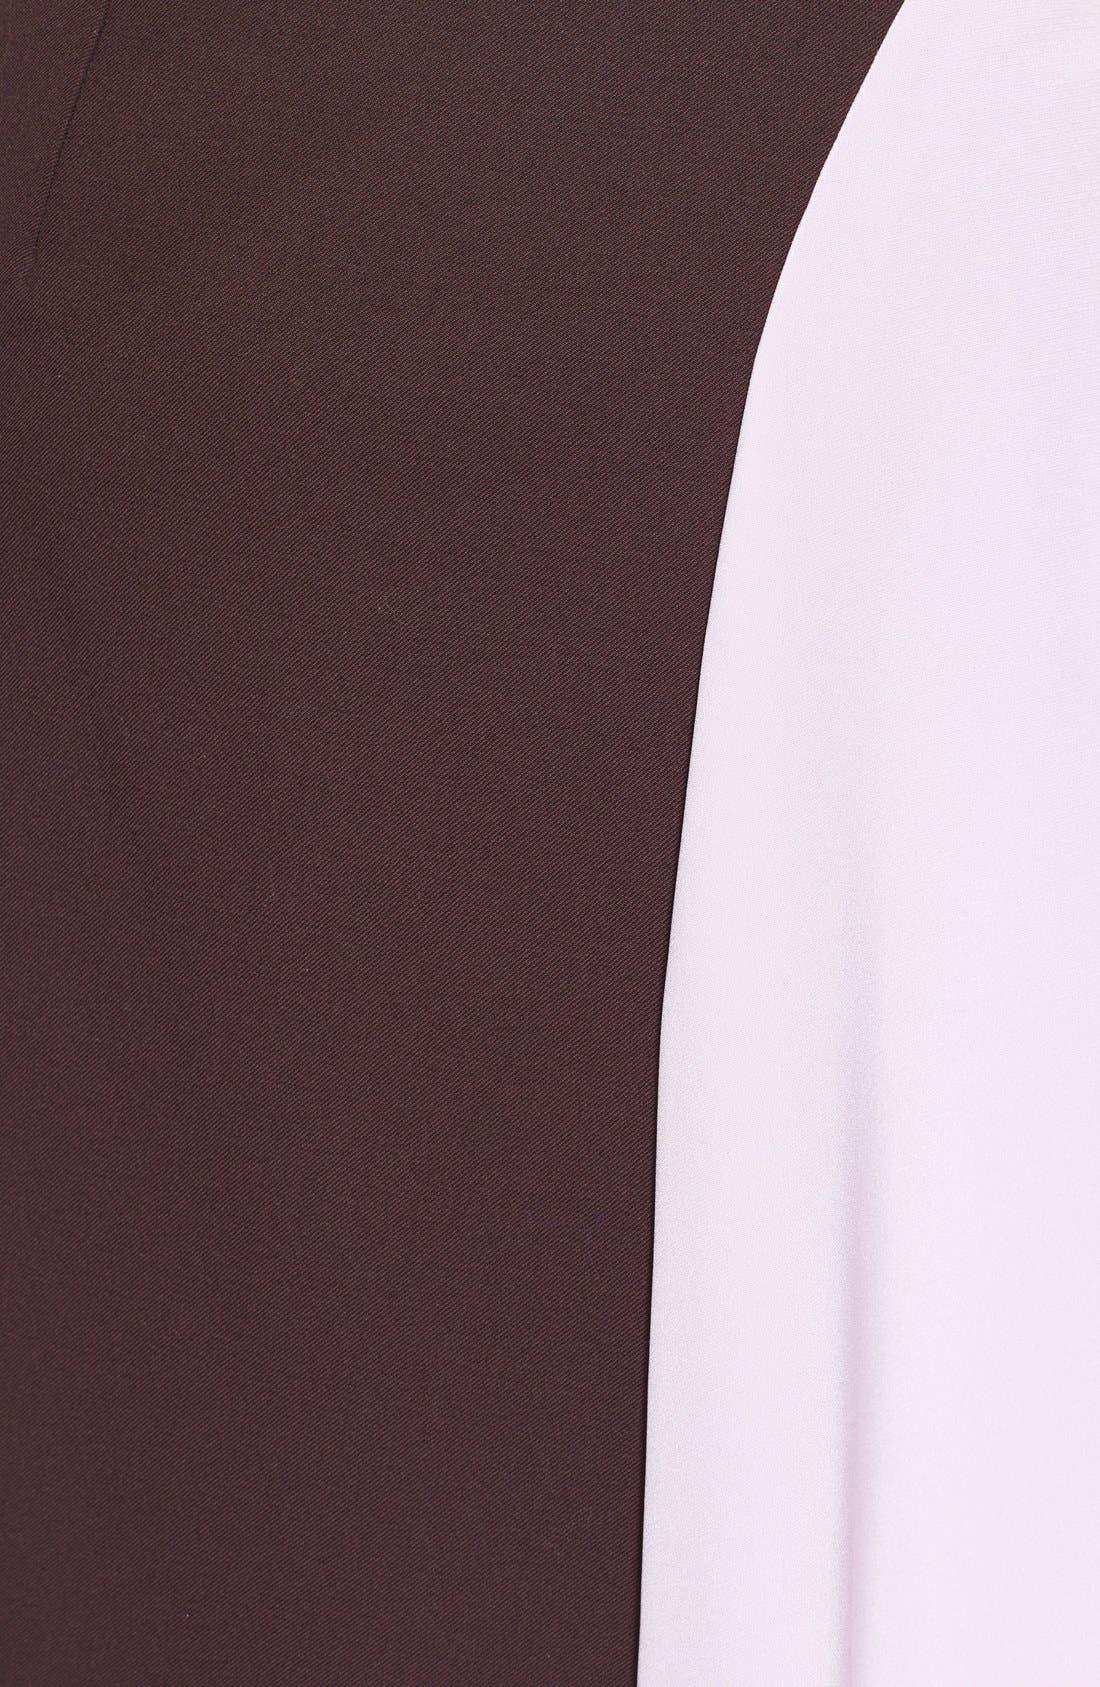 Alternate Image 3  - 3.1 Phillip Lim 'Horizon' Wool & Crêpe de Chine Skirt